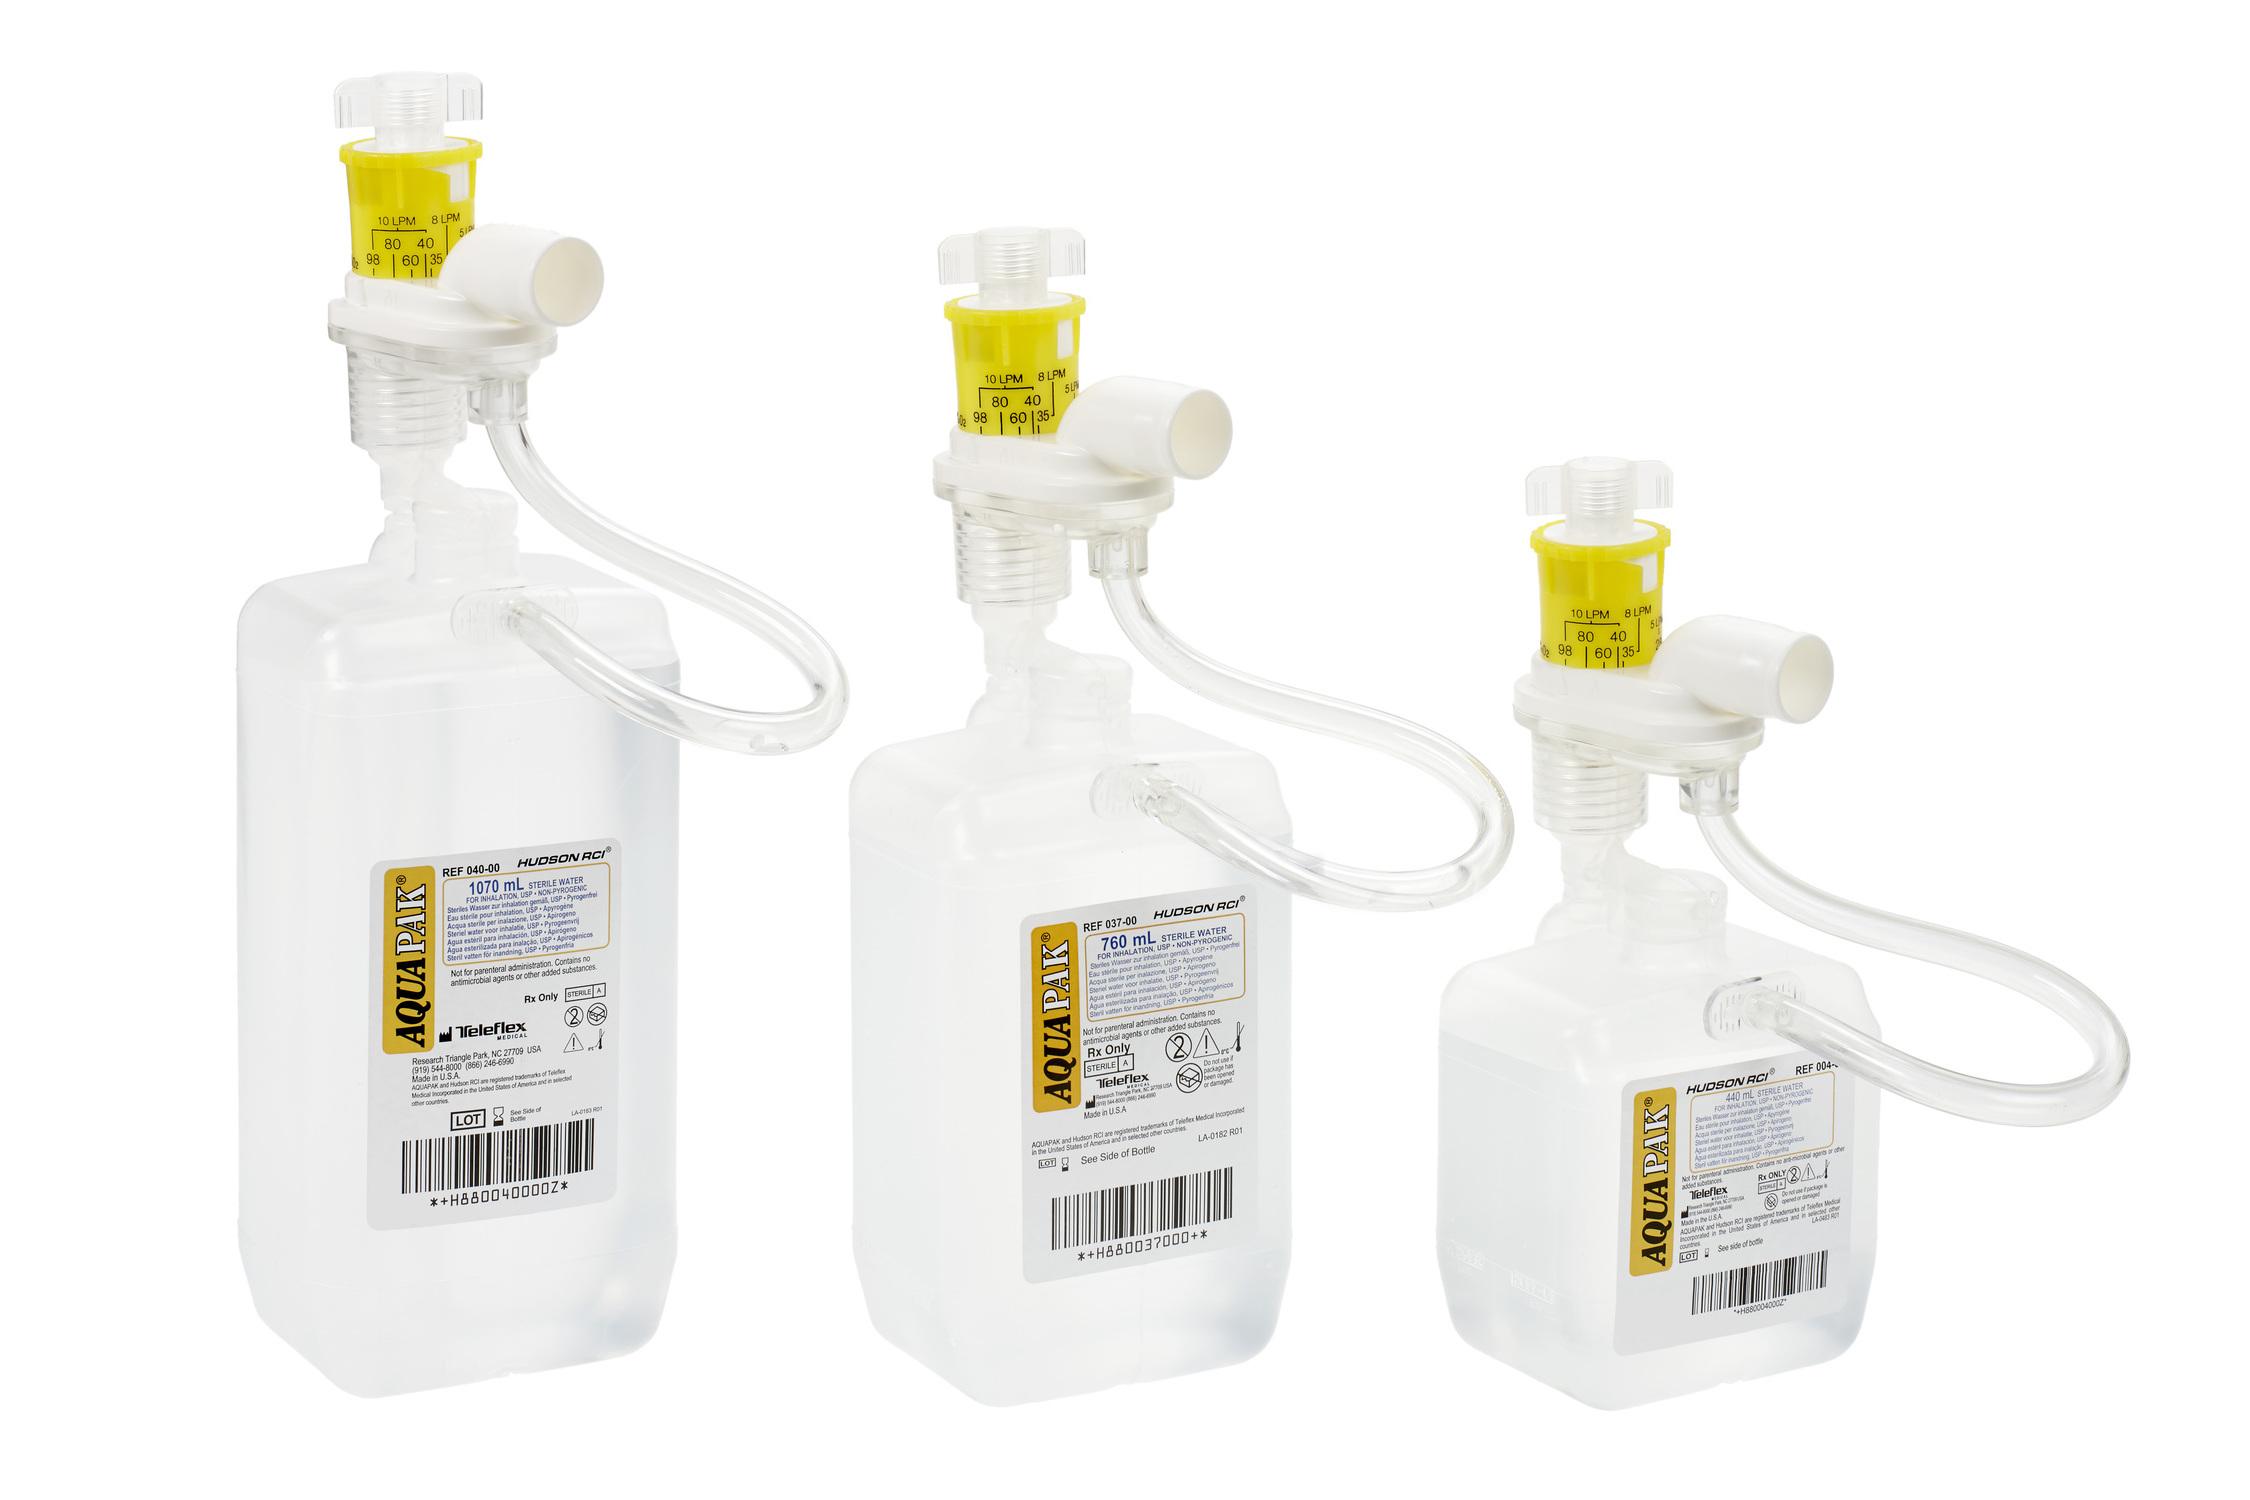 Aquapak Nebulizer Sterile Water Prefilled Nebulizer, 044-33, 440 mL - Case of 20